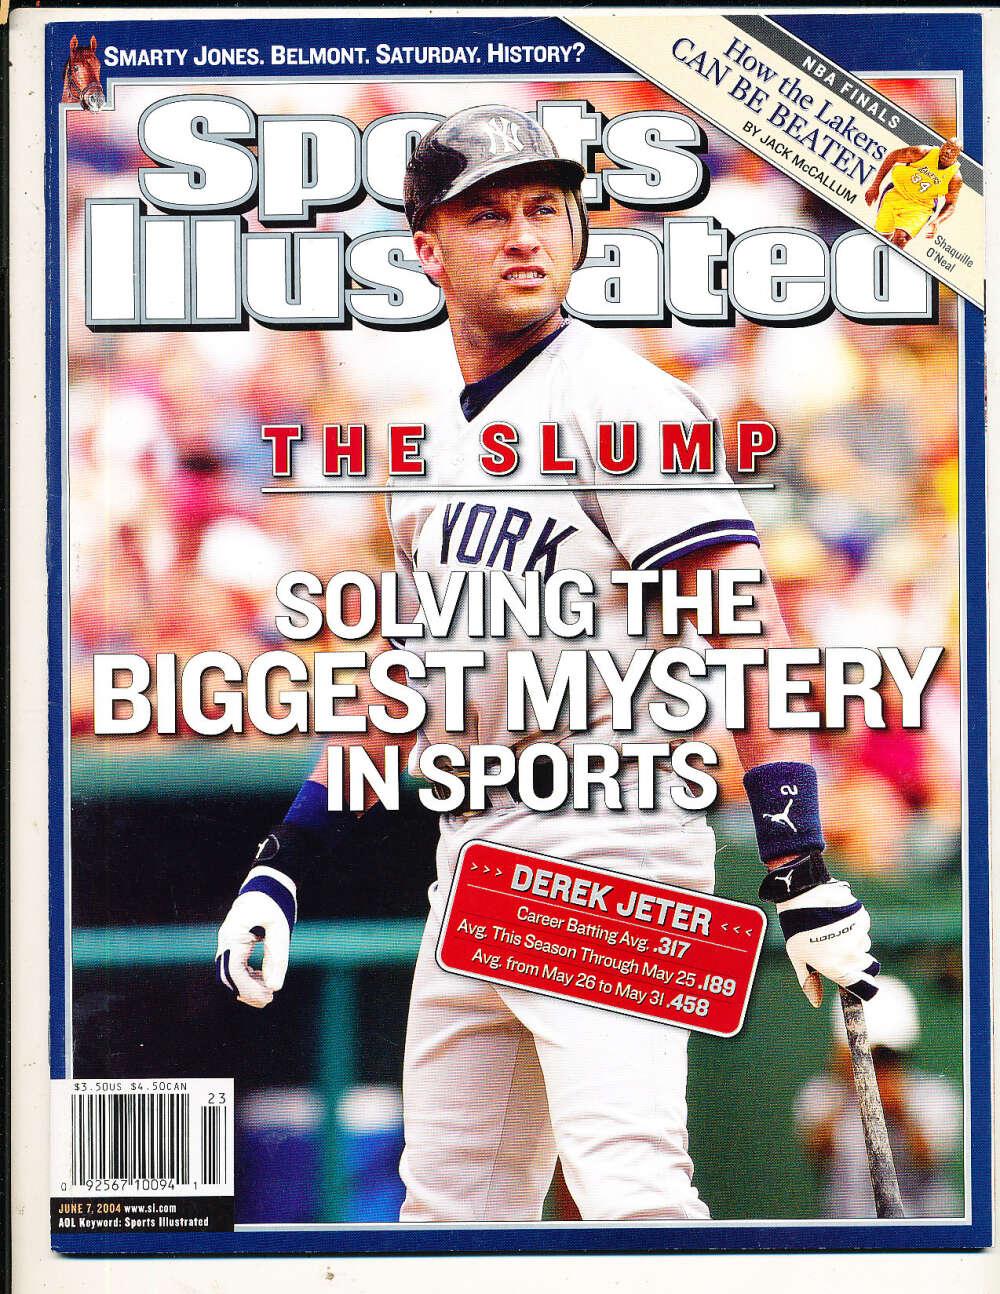 6/7 2004 Derek Jeter Yankees Sports Illustrated mint no label